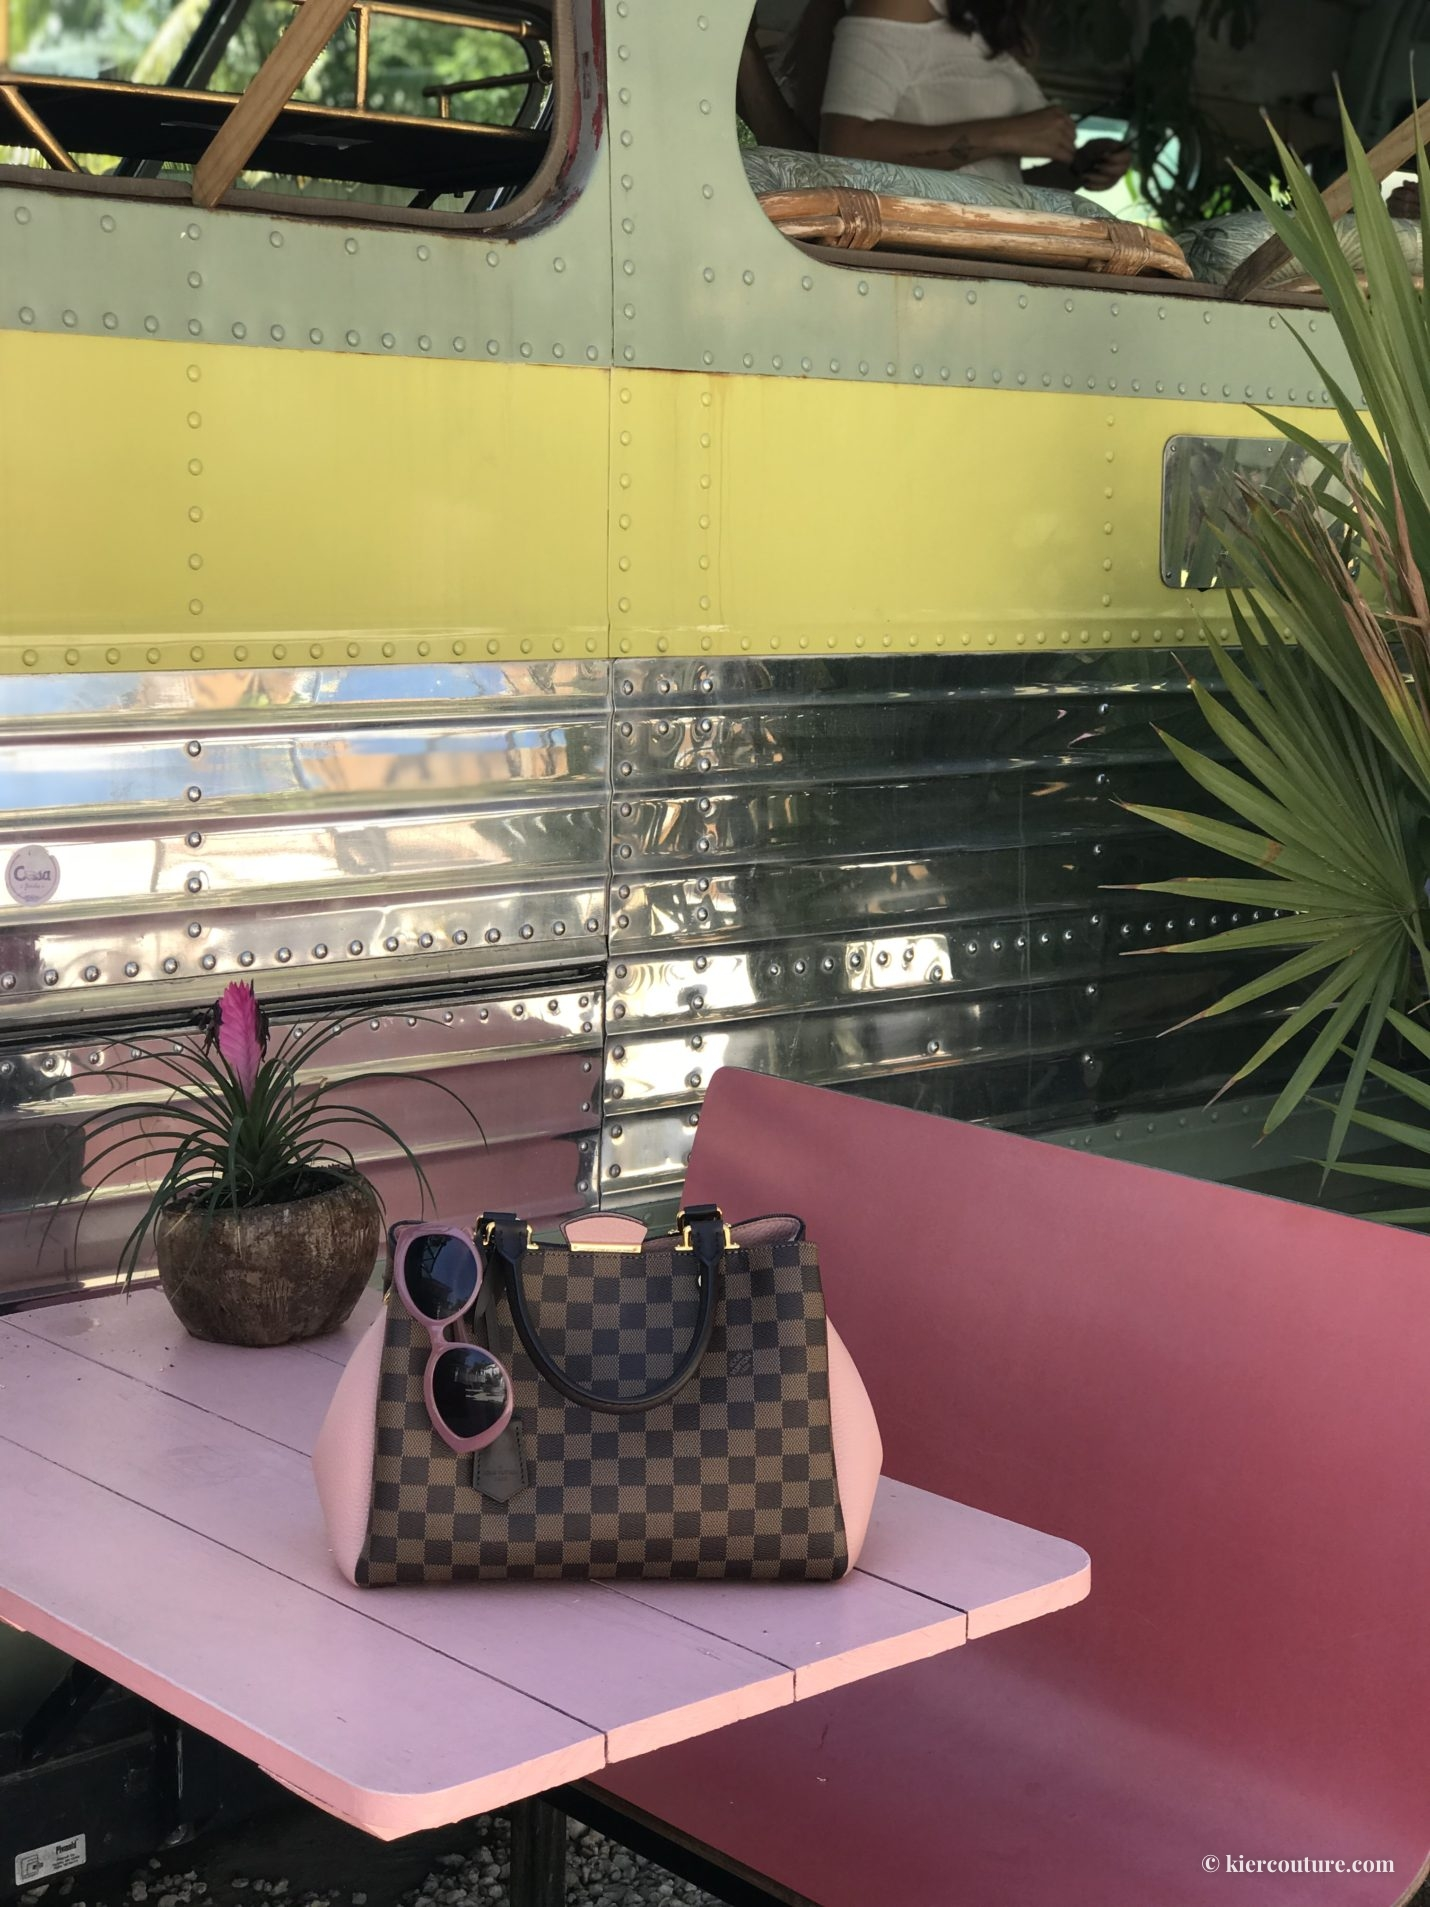 Louis Vuitton Brittany handbag